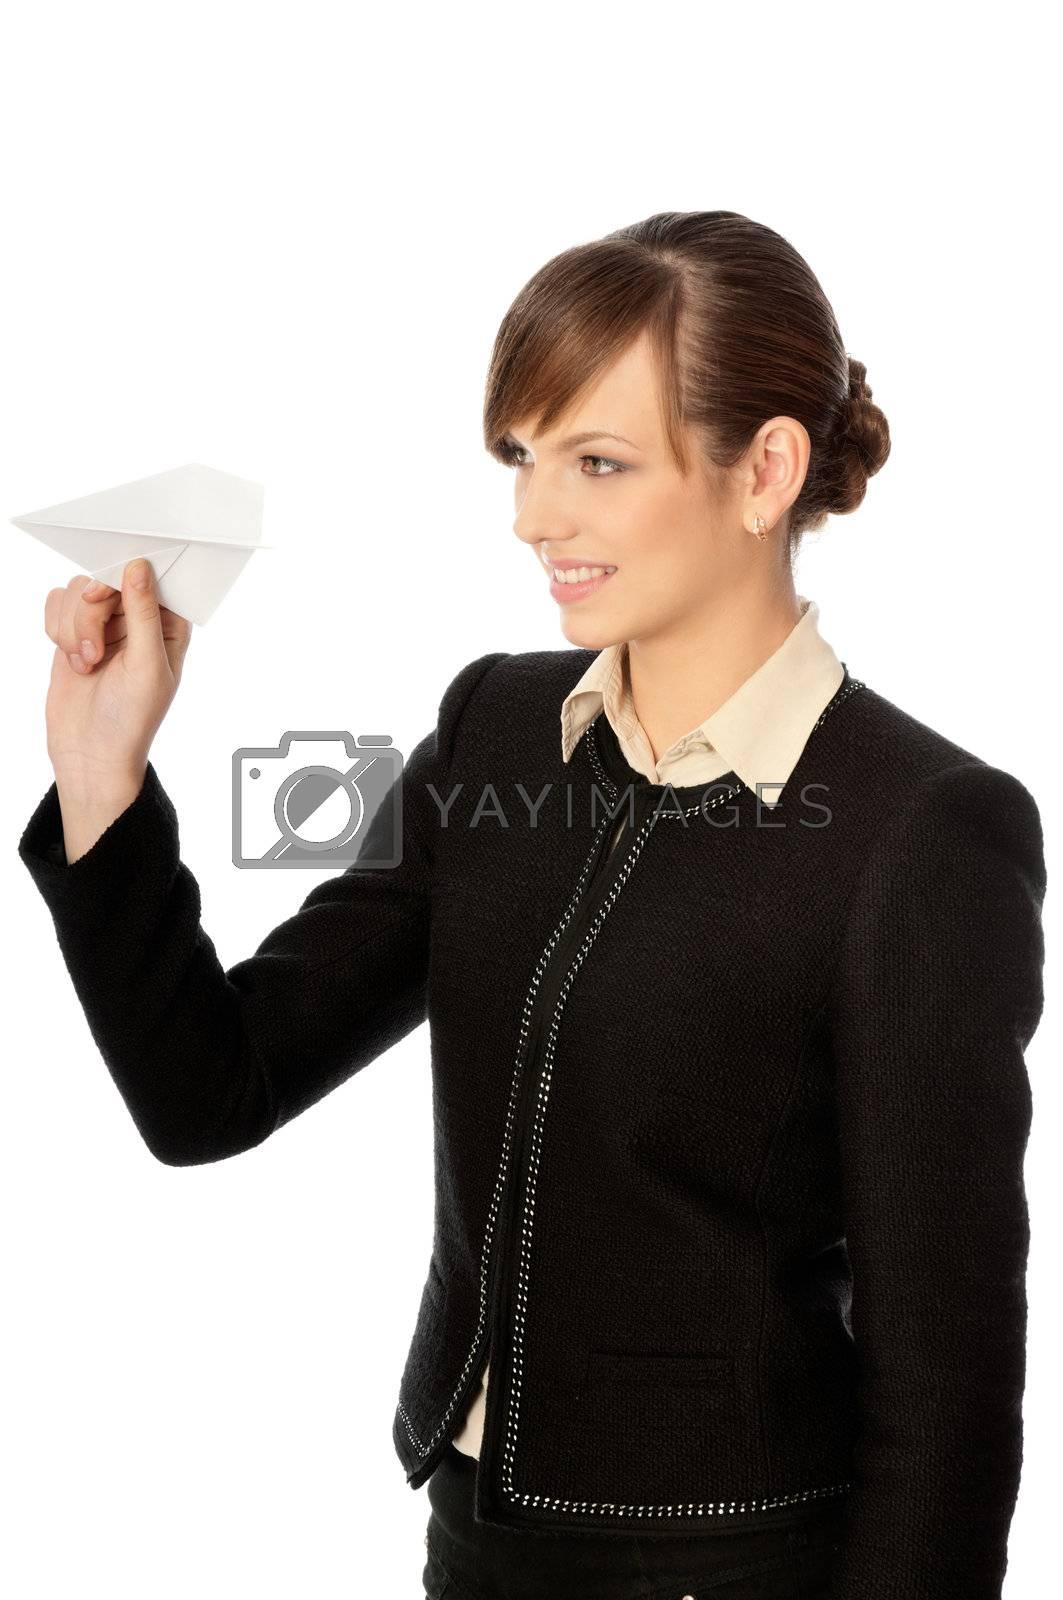 Businesswoman throwing white paper plane on the break